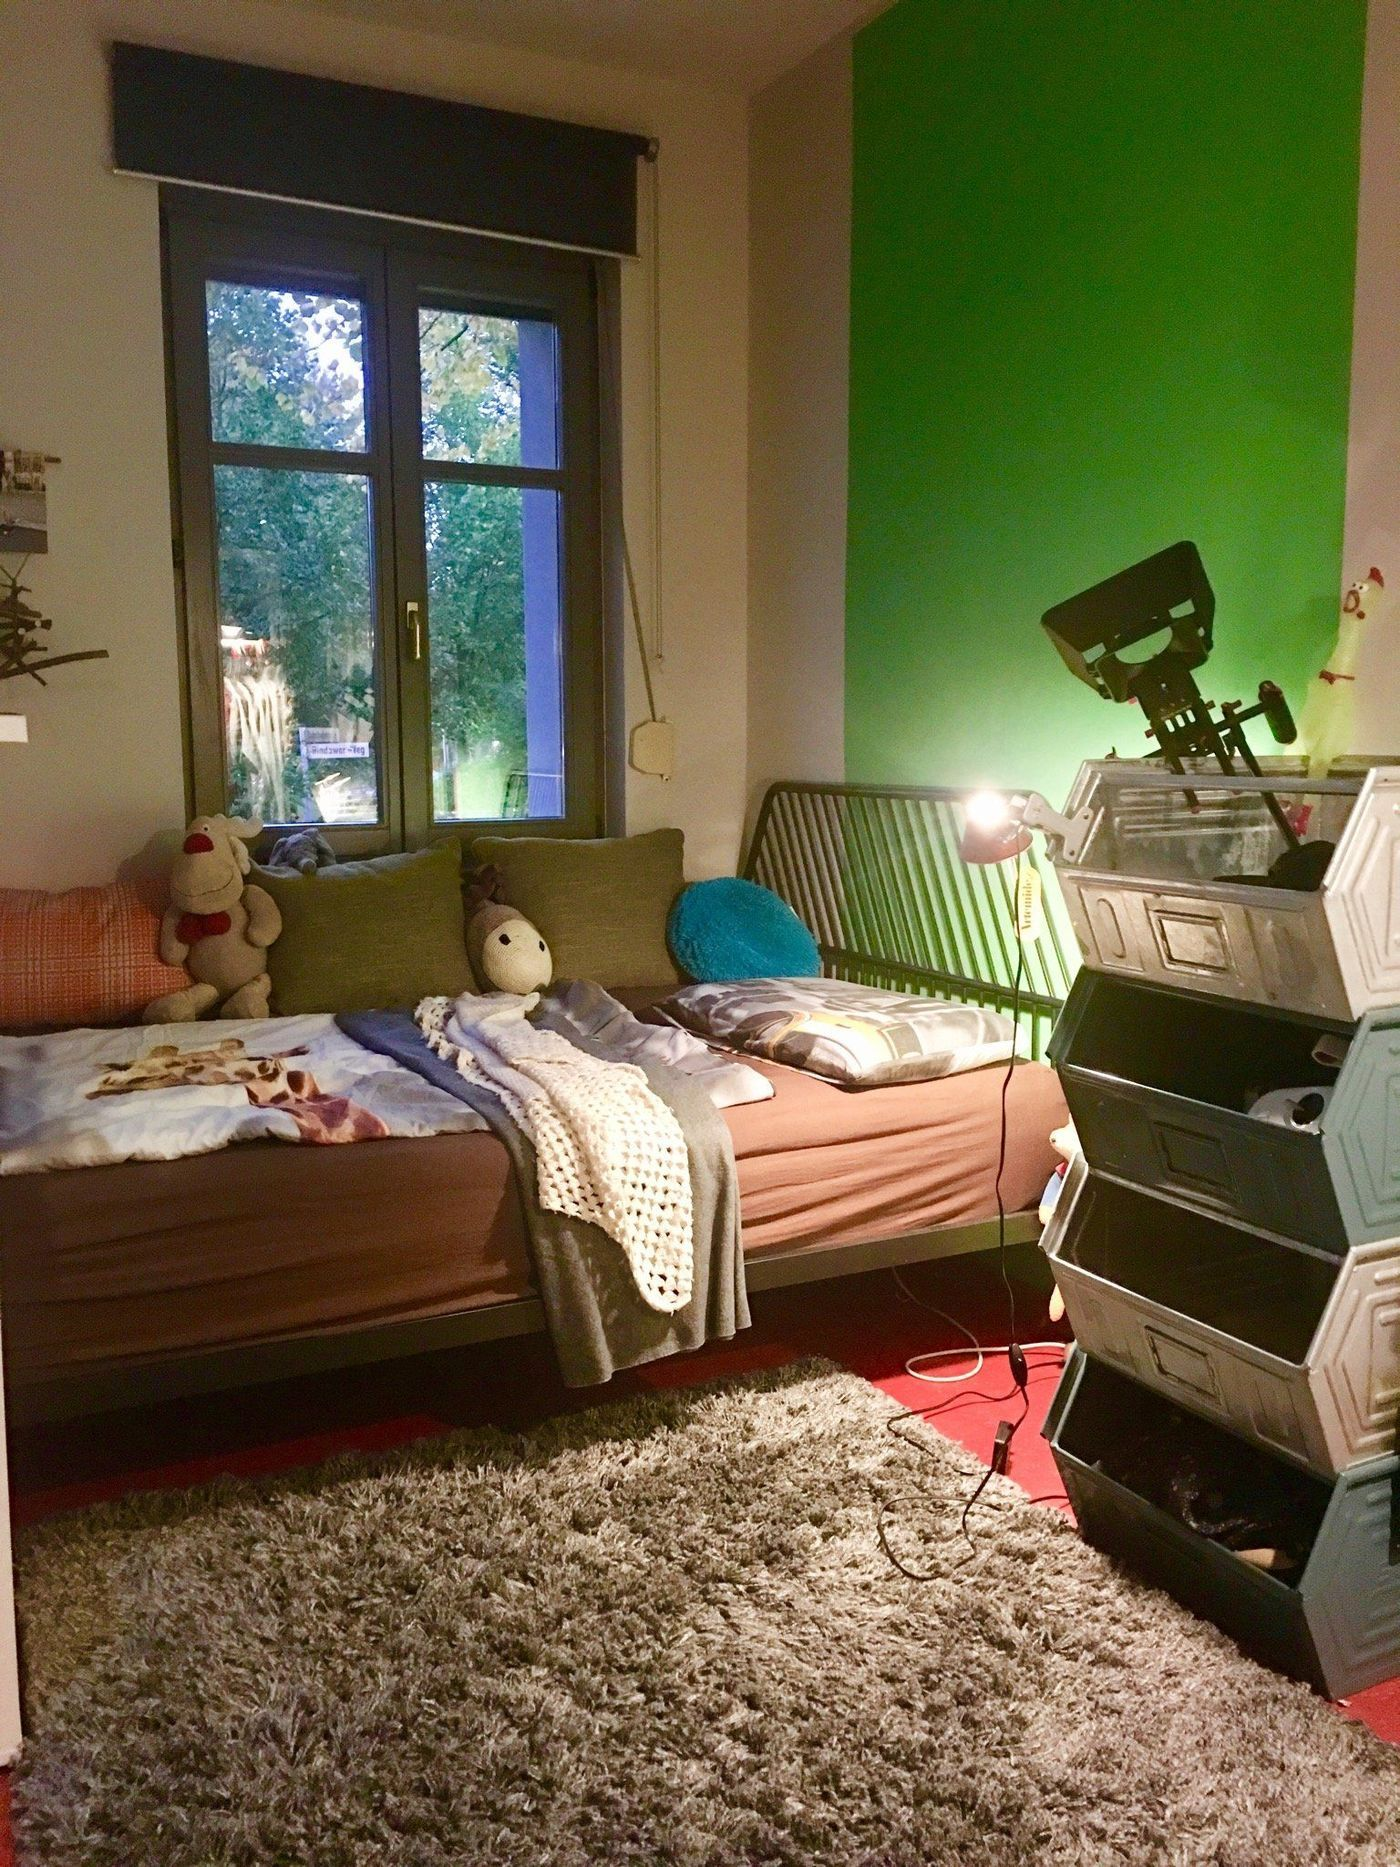 Jugendzimmer Heimlich Fotografiert Arger